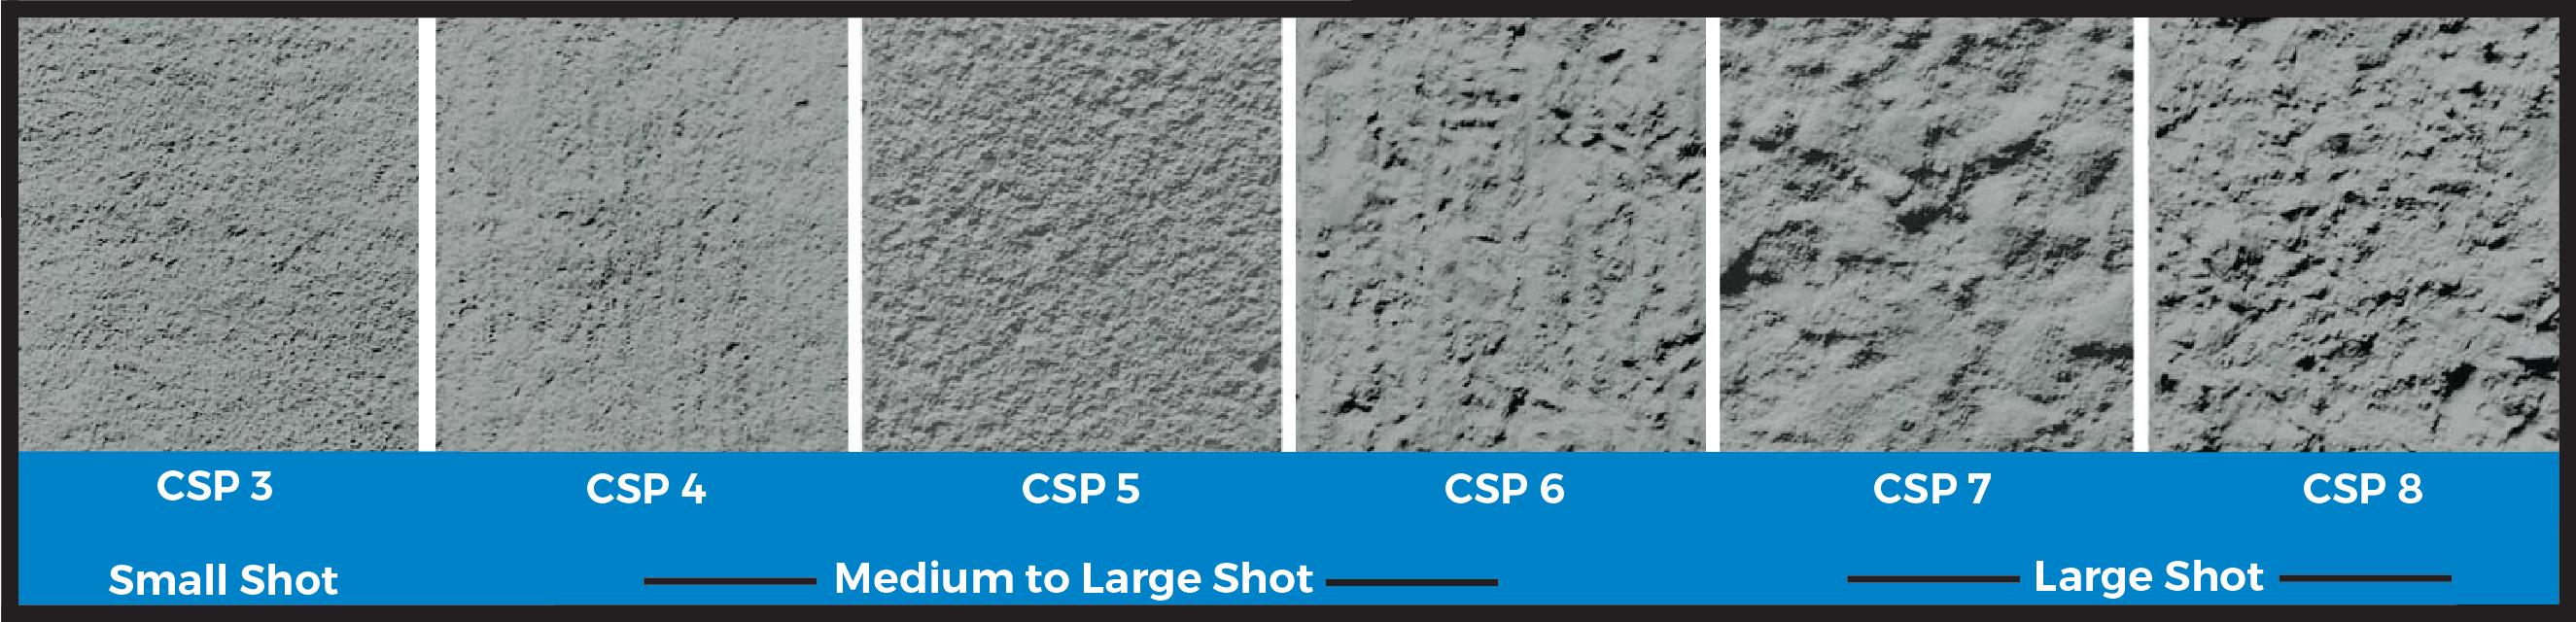 Concrete_Surface_Profile_Scale.png